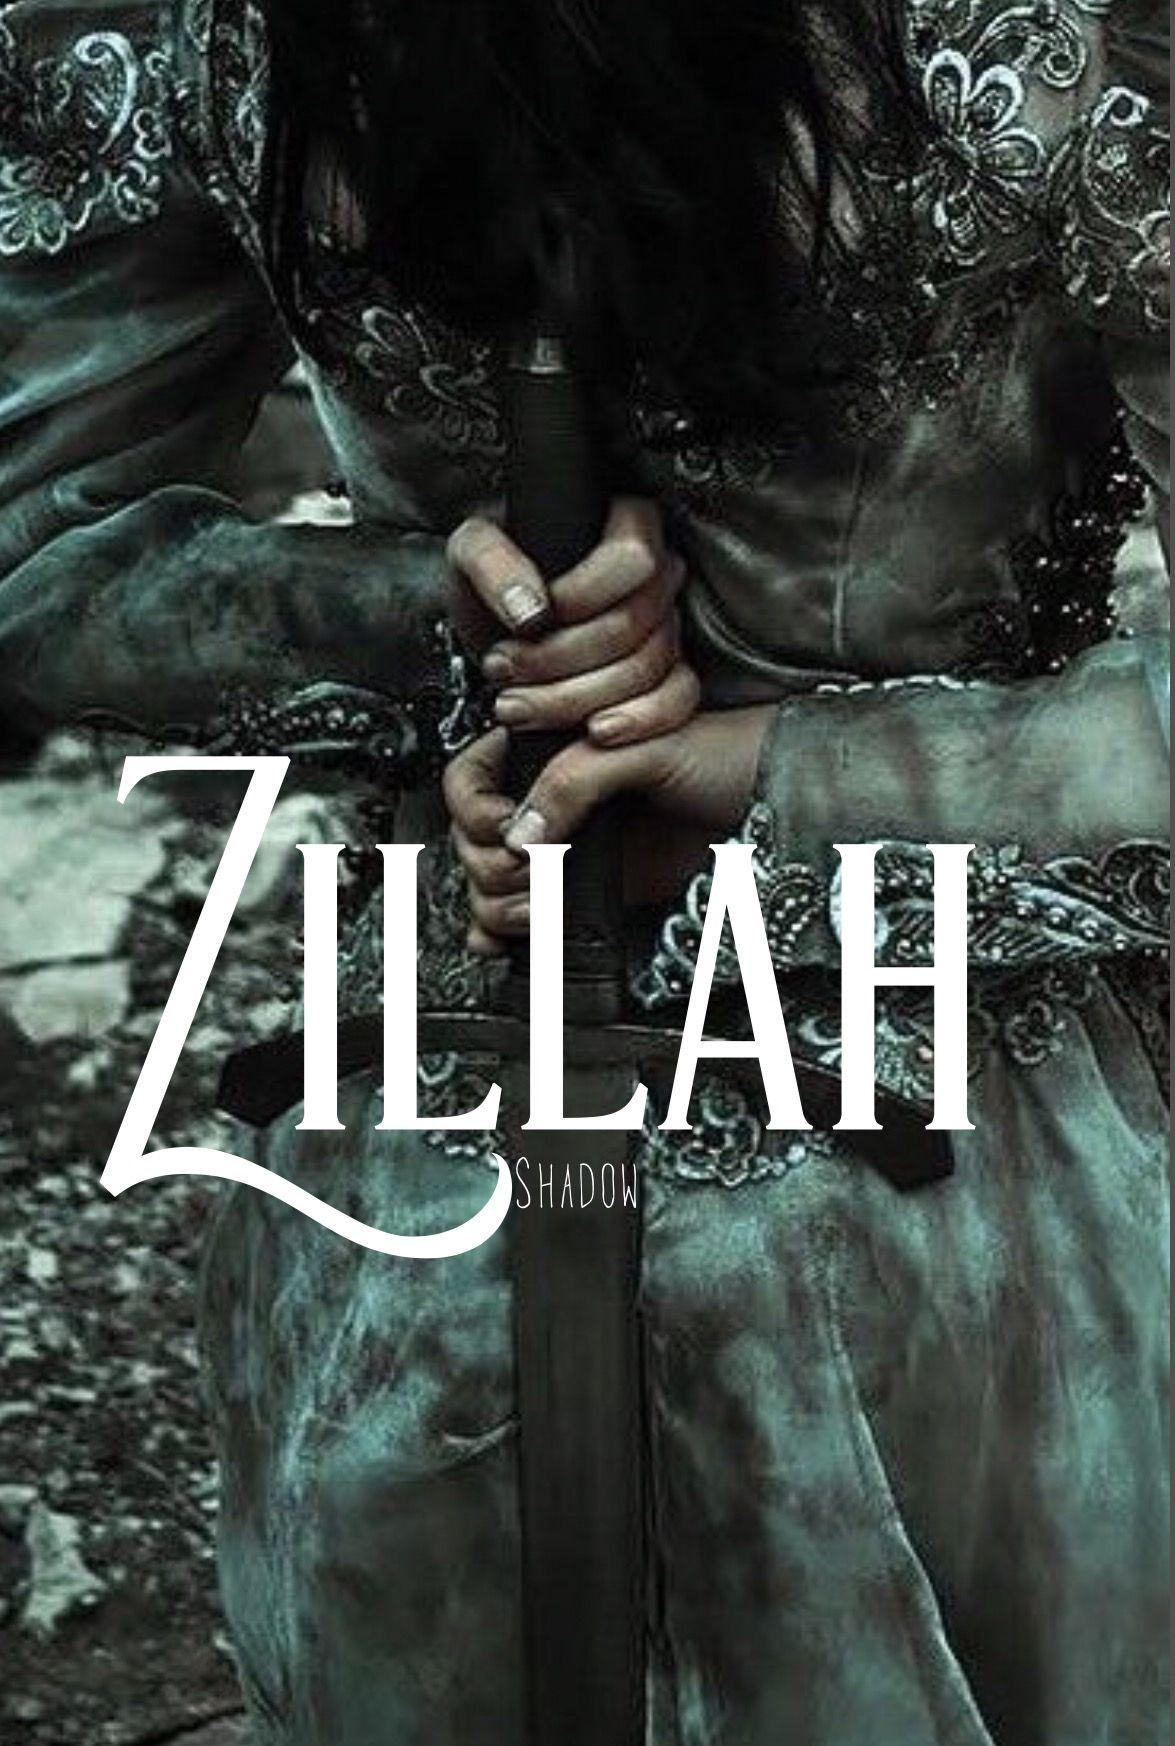 Zillah, meaning shadow. Biblical names, Hebrew names, Z